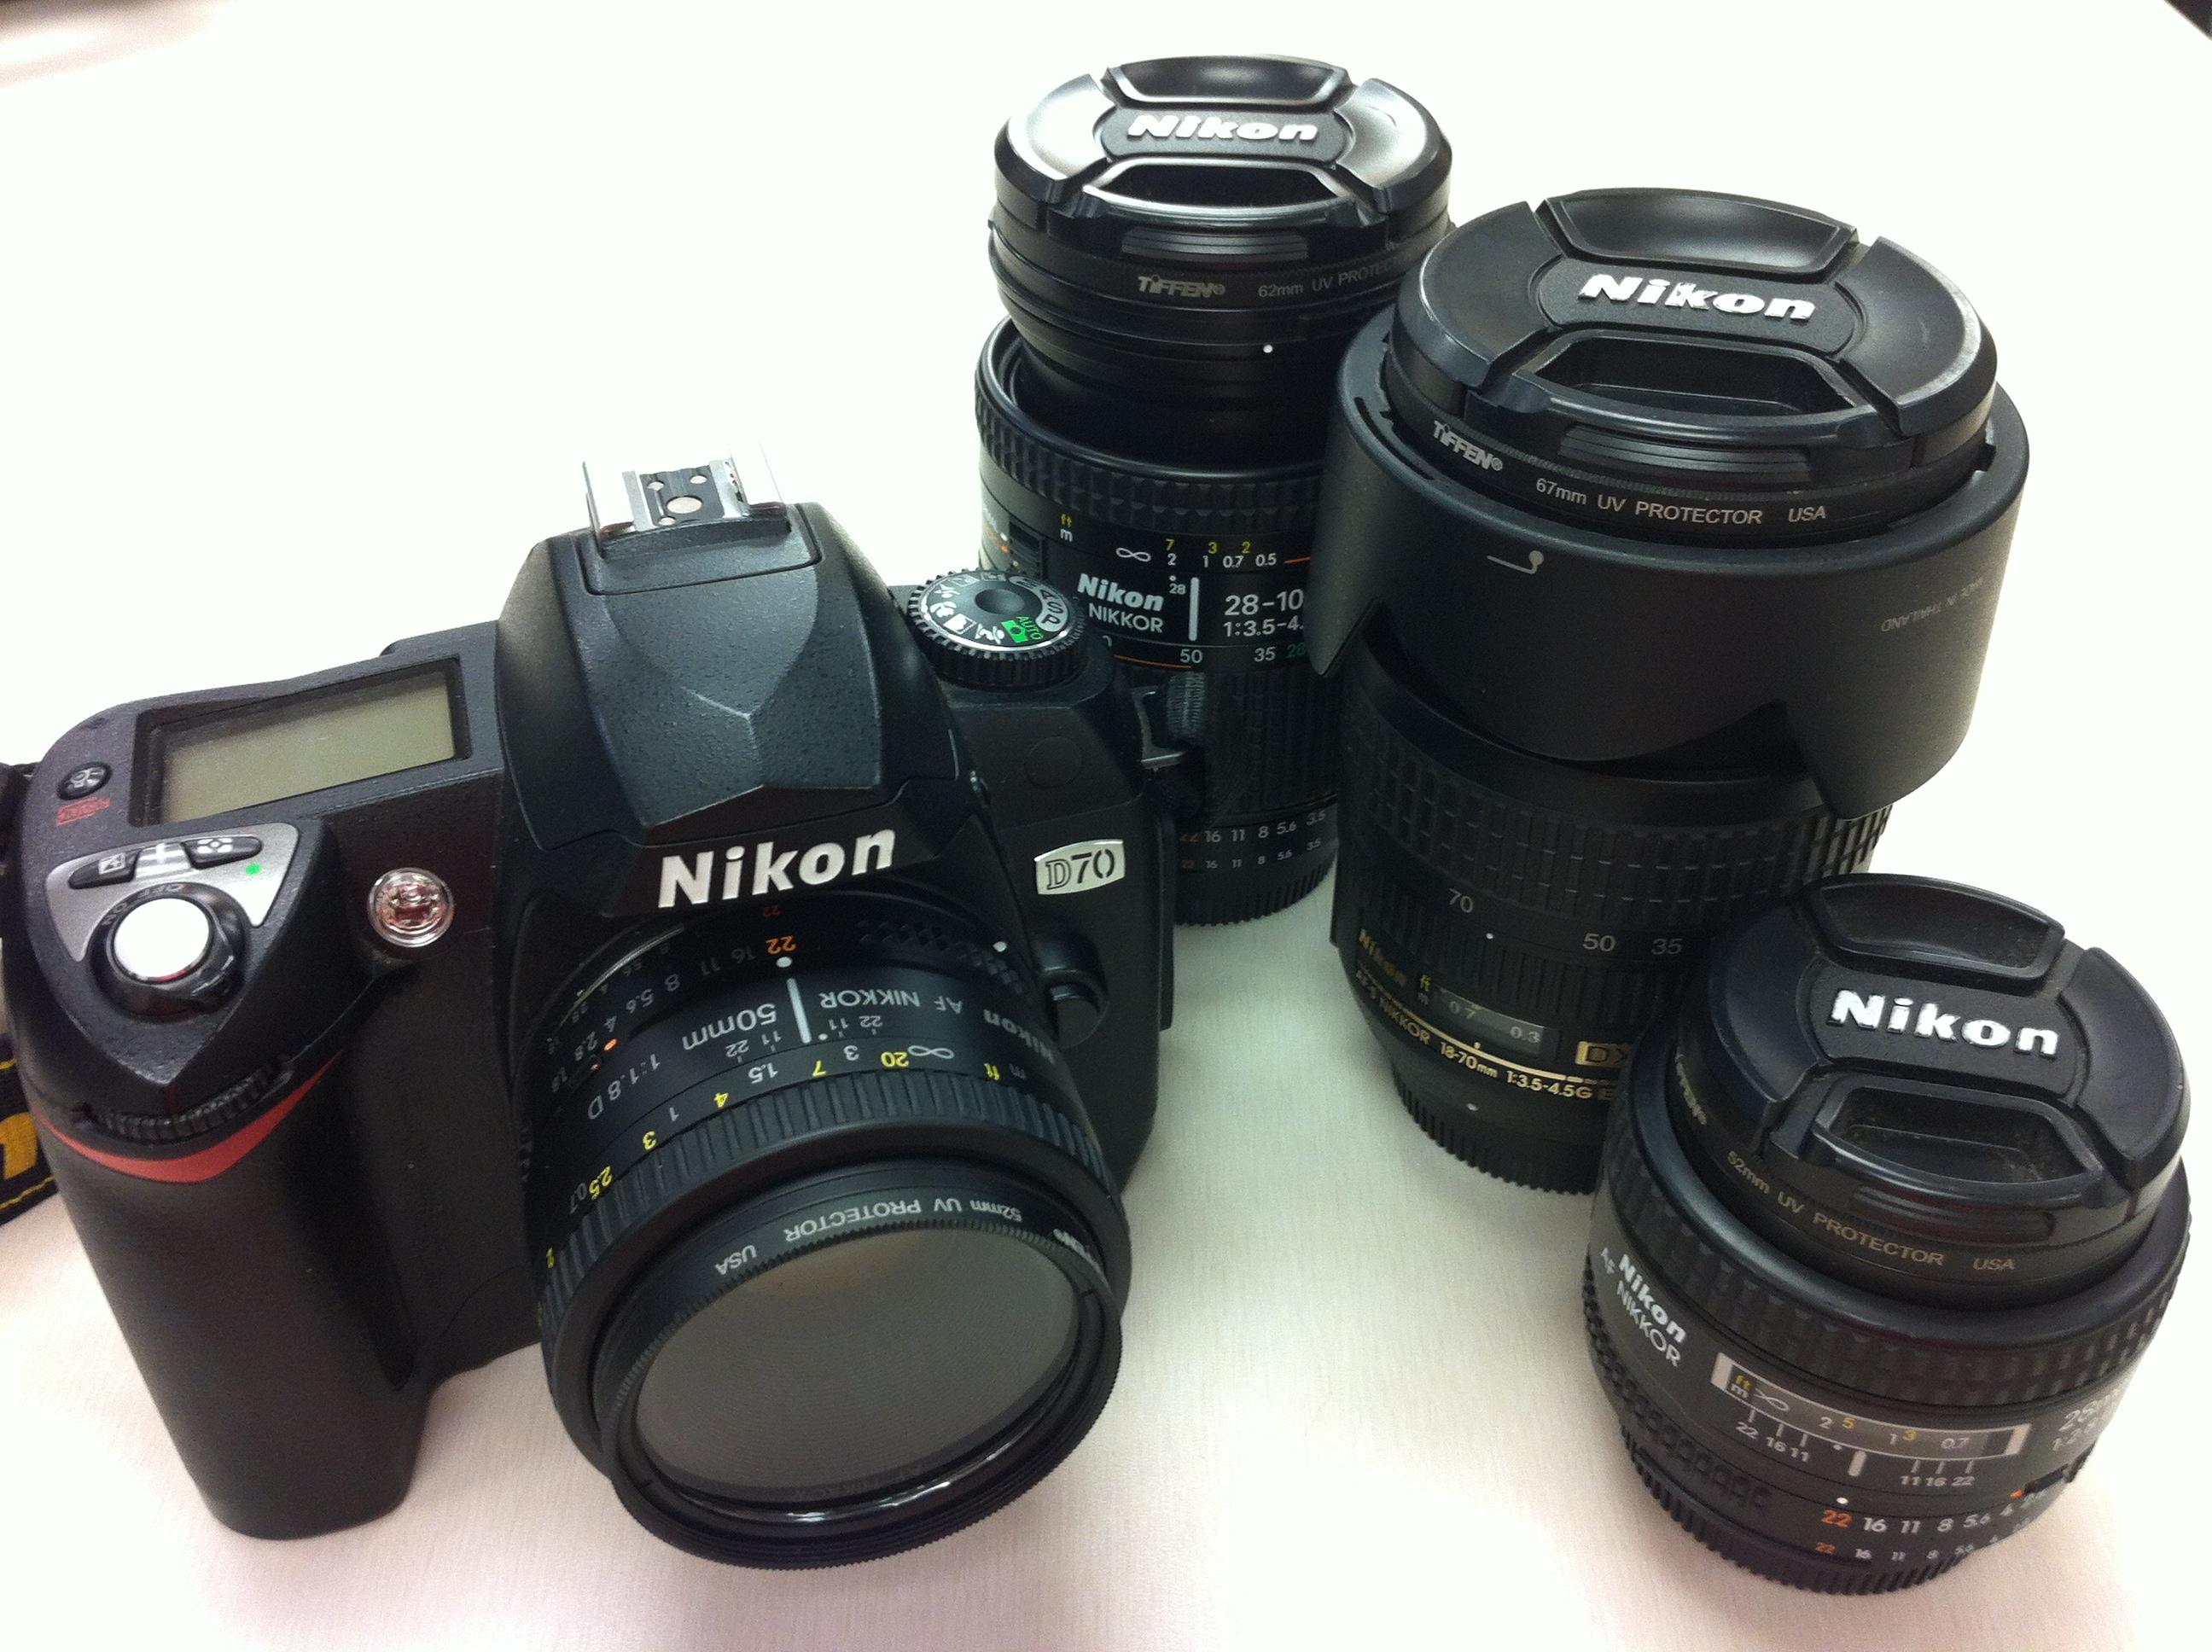 Nikon D70 | Geo... D70 Nikon